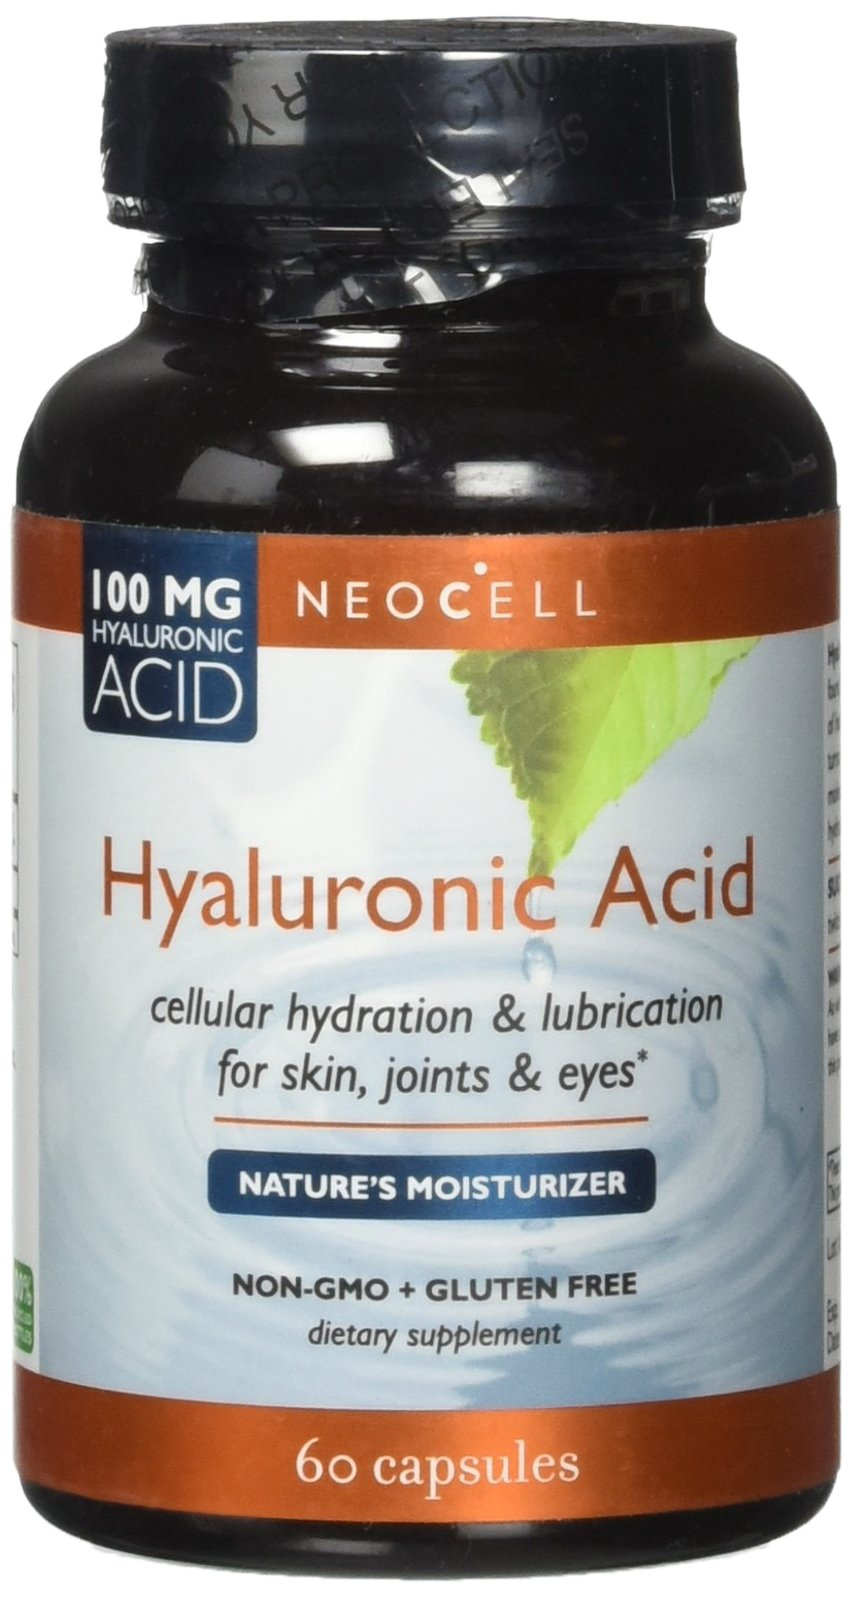 Neocell - Hyaluronic Acid 60 cap